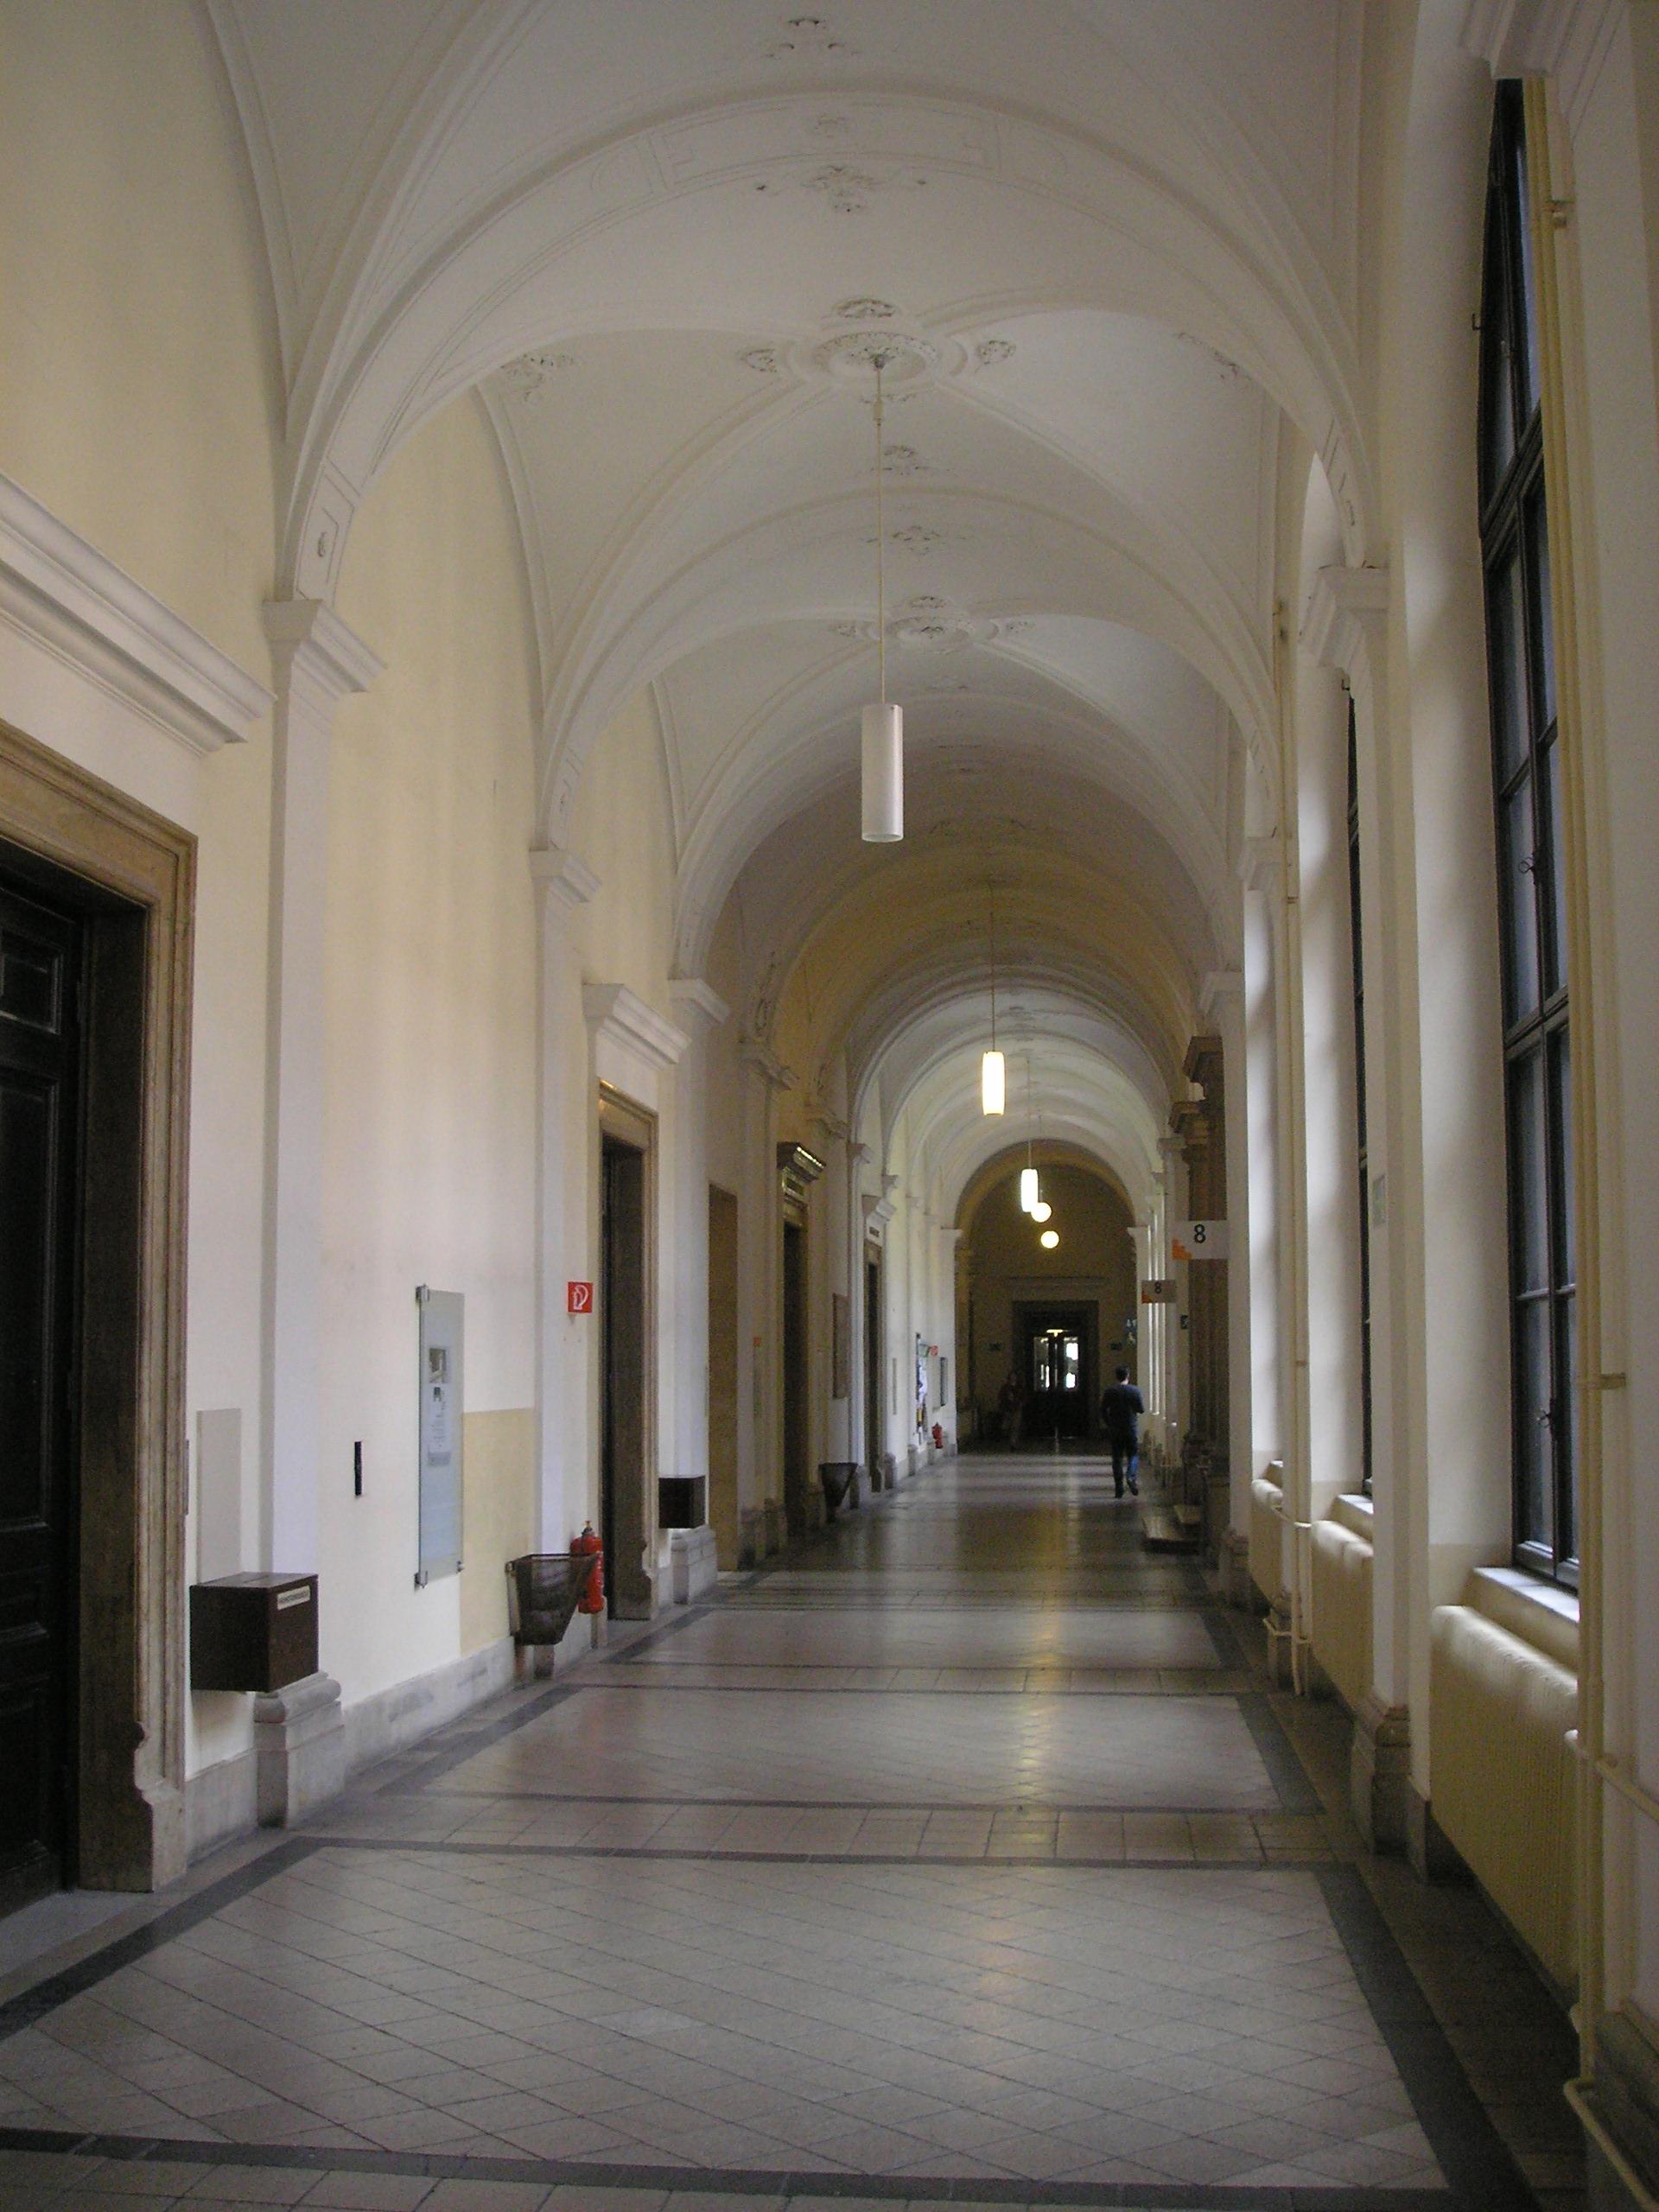 FileUni Wien Hallway Viennajpg  Wikimedia Commons